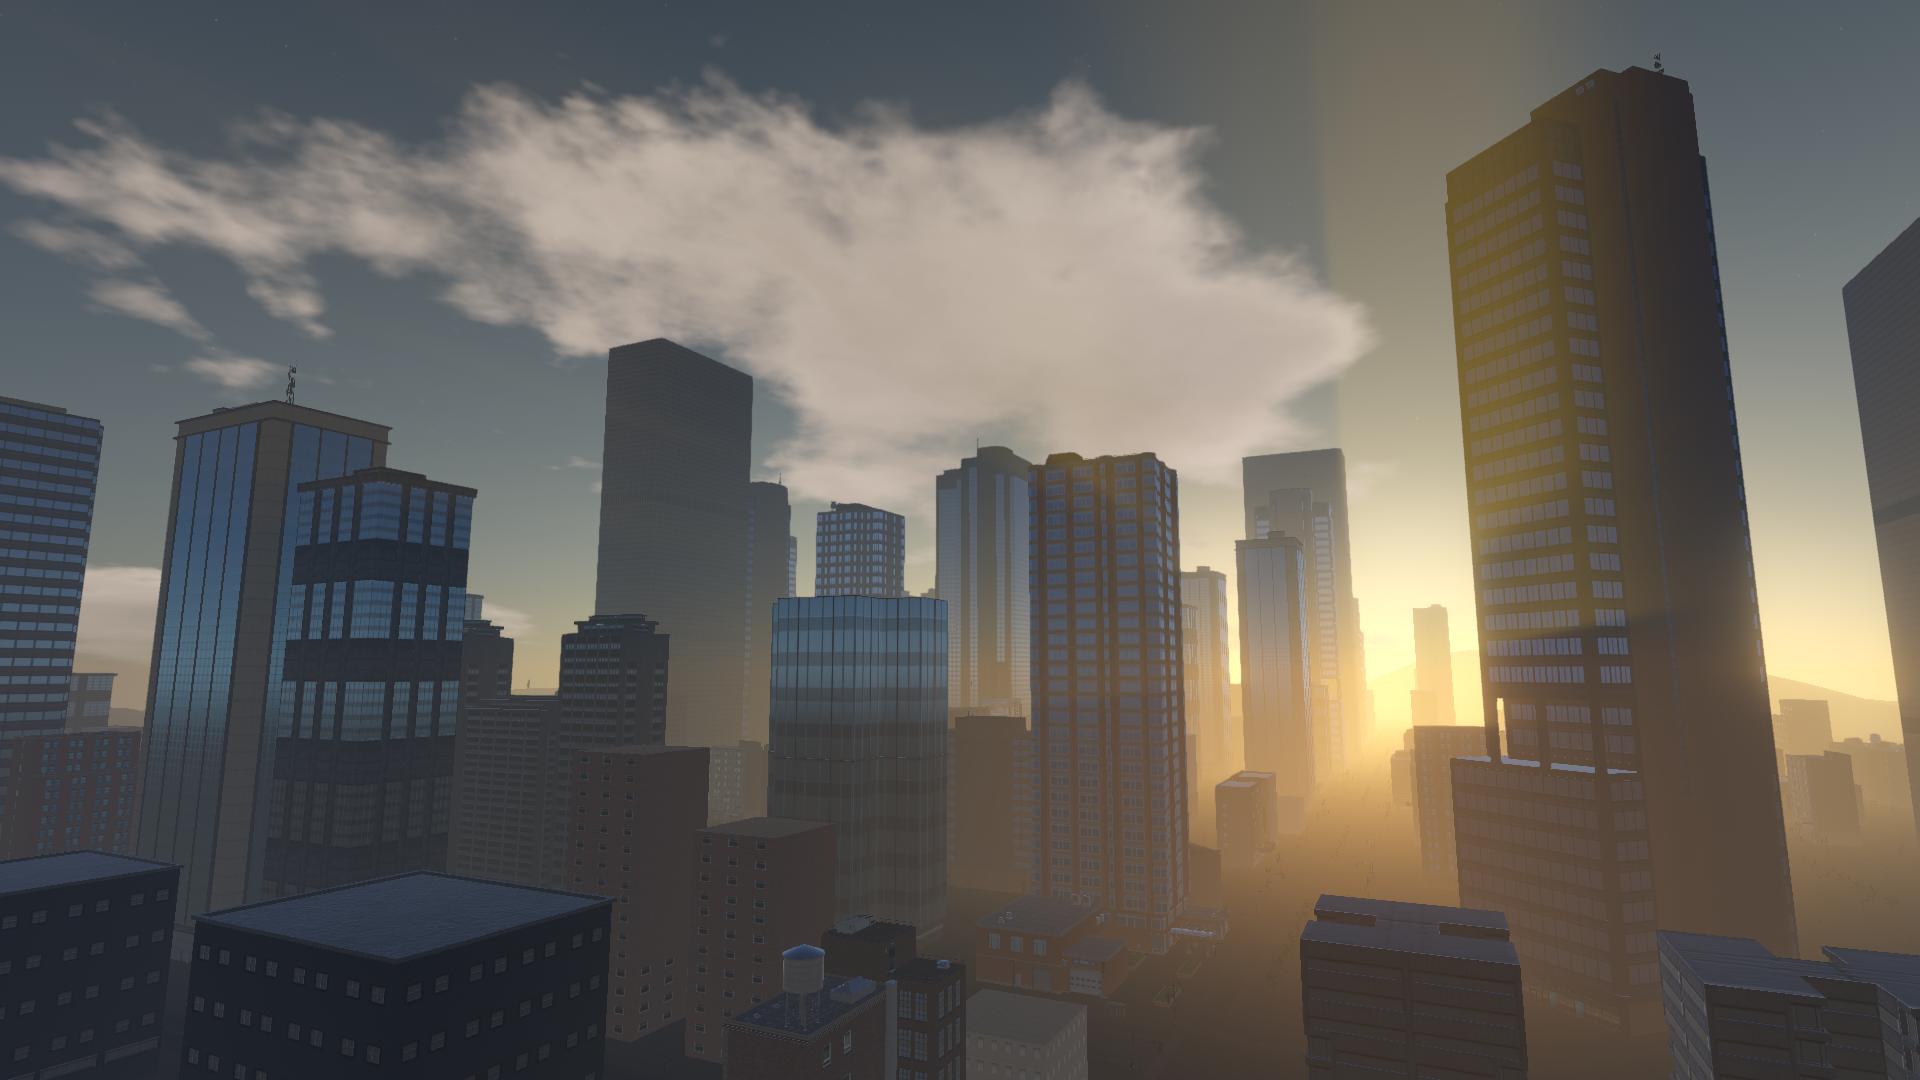 Lucid City sunset